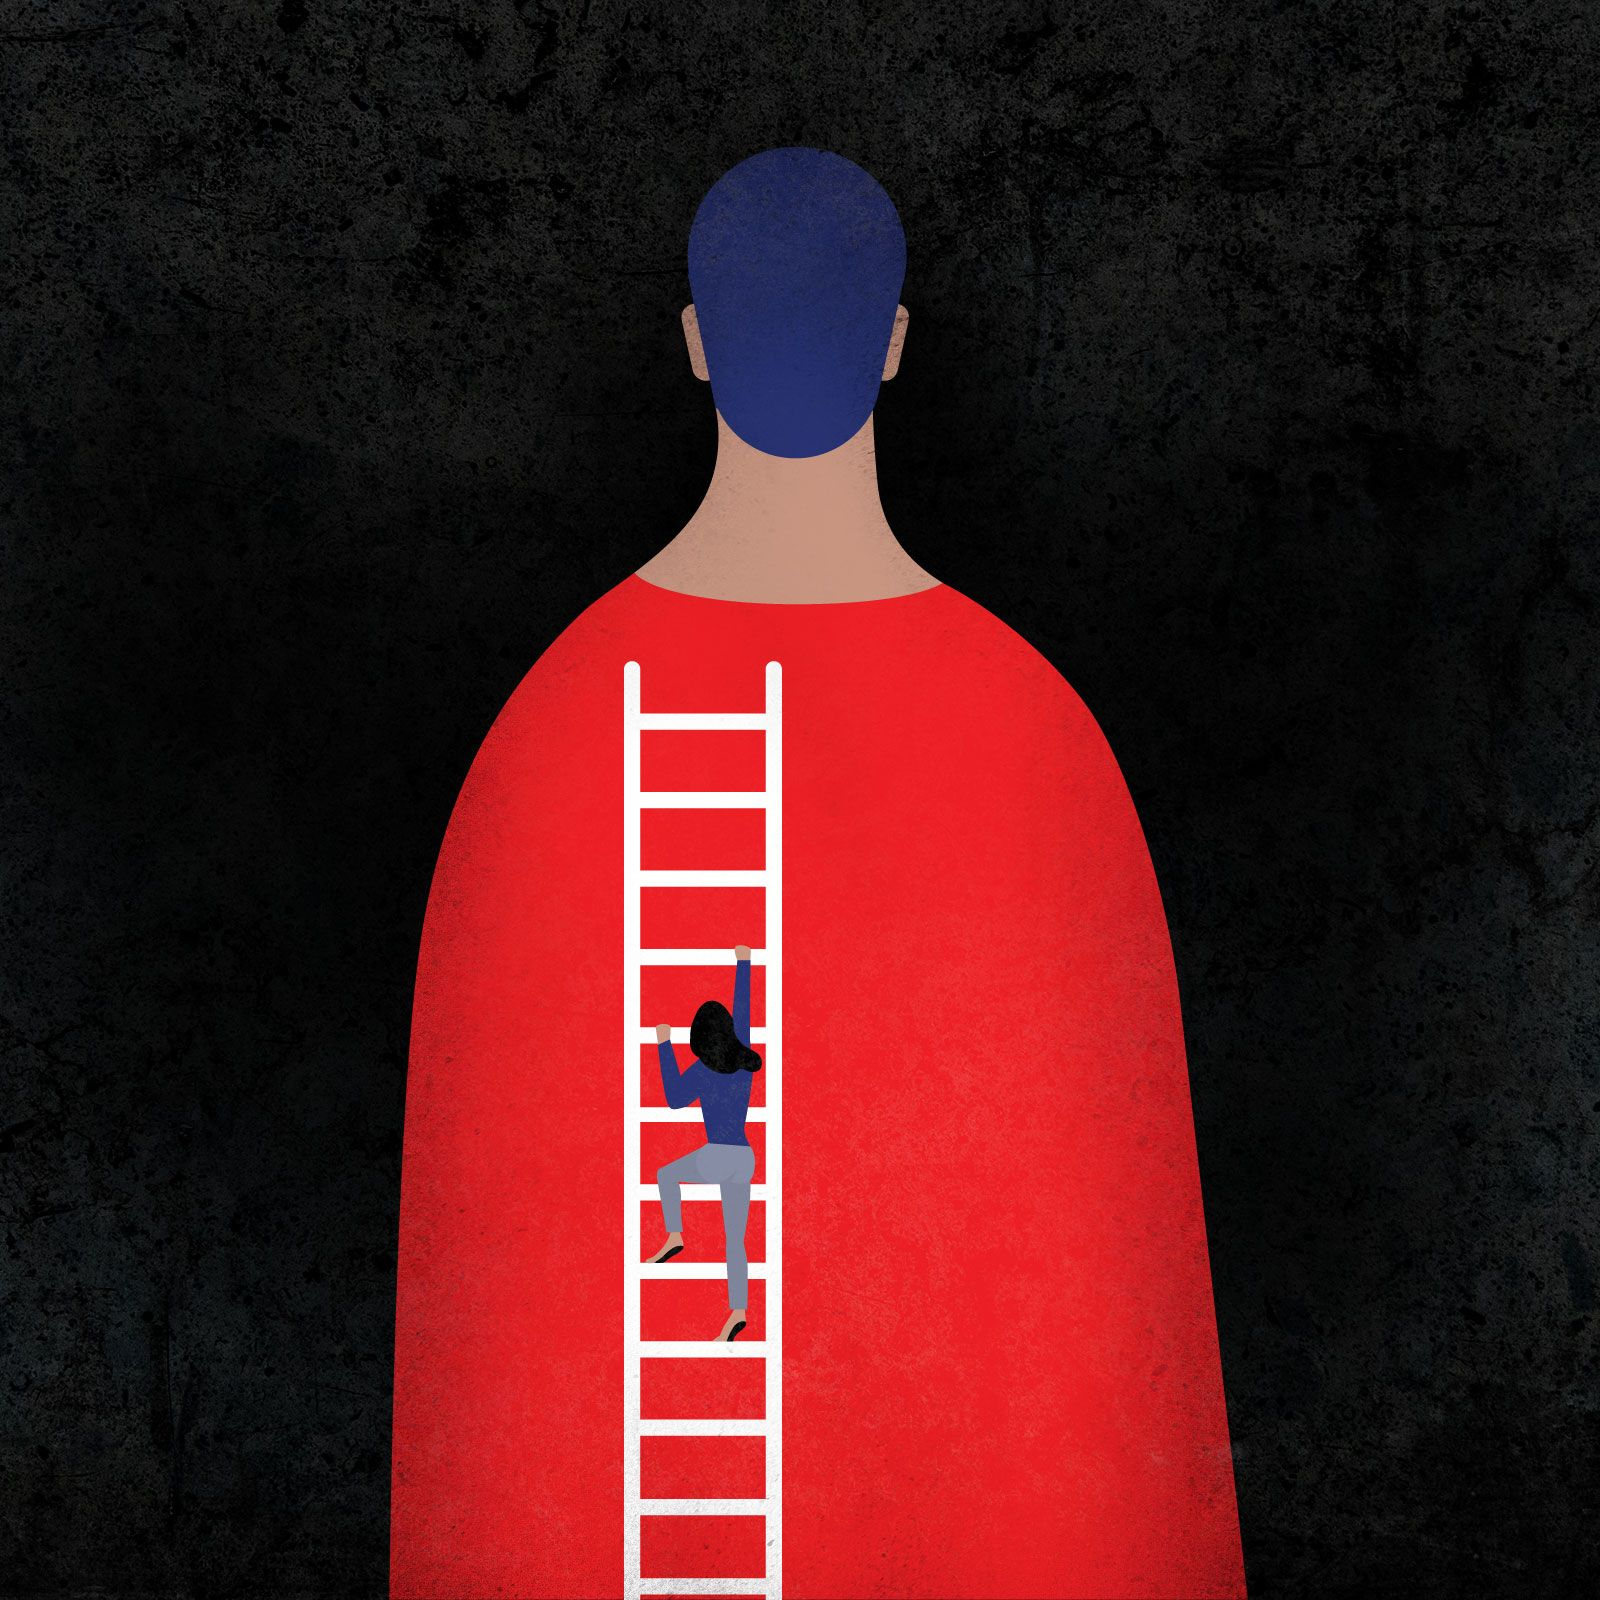 garance-illustration-Irina-Kruglova-man